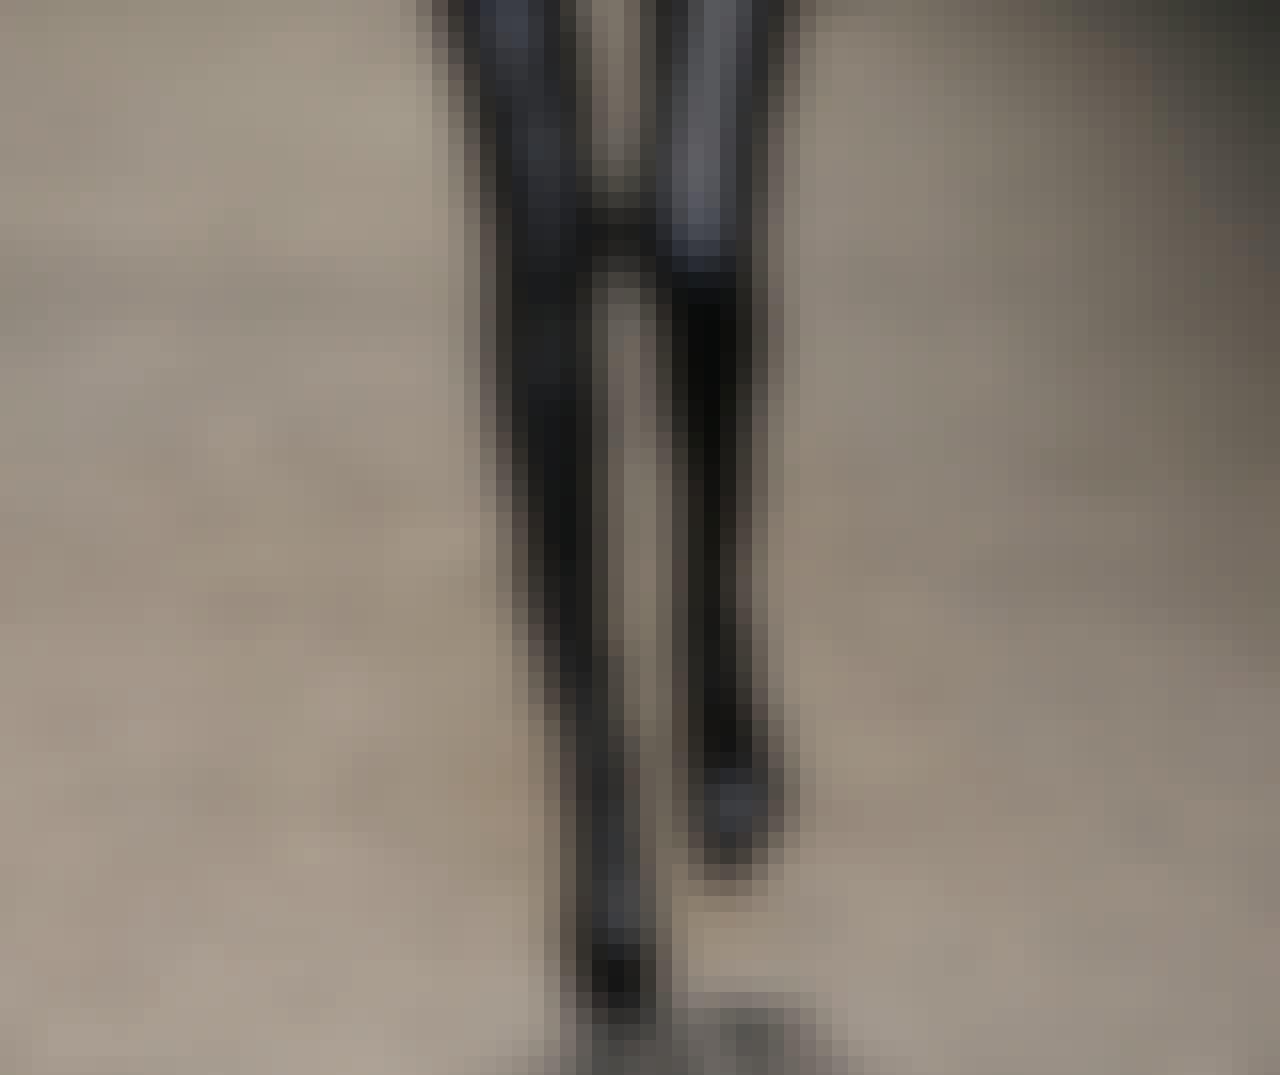 Stella McCartney viste åletrange, lårhøye støvletter.